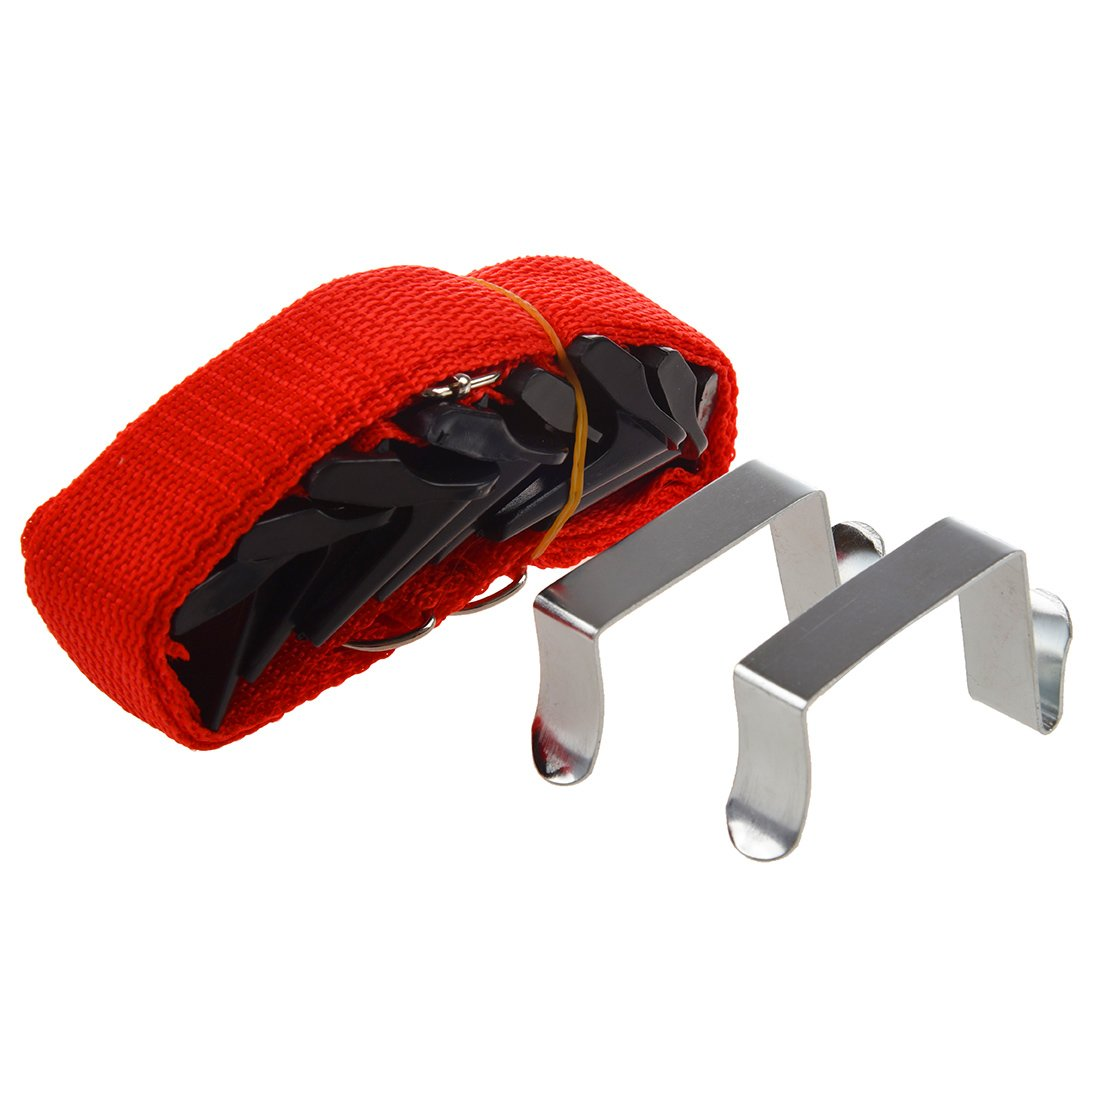 Tmalltide Adjustable Over the Door Straps Hanger Hat Clothes Coat Bag Rack Organizer Handbags/Purses/Scarves/Hats in Hanging Package With 8 Hooks (Green)